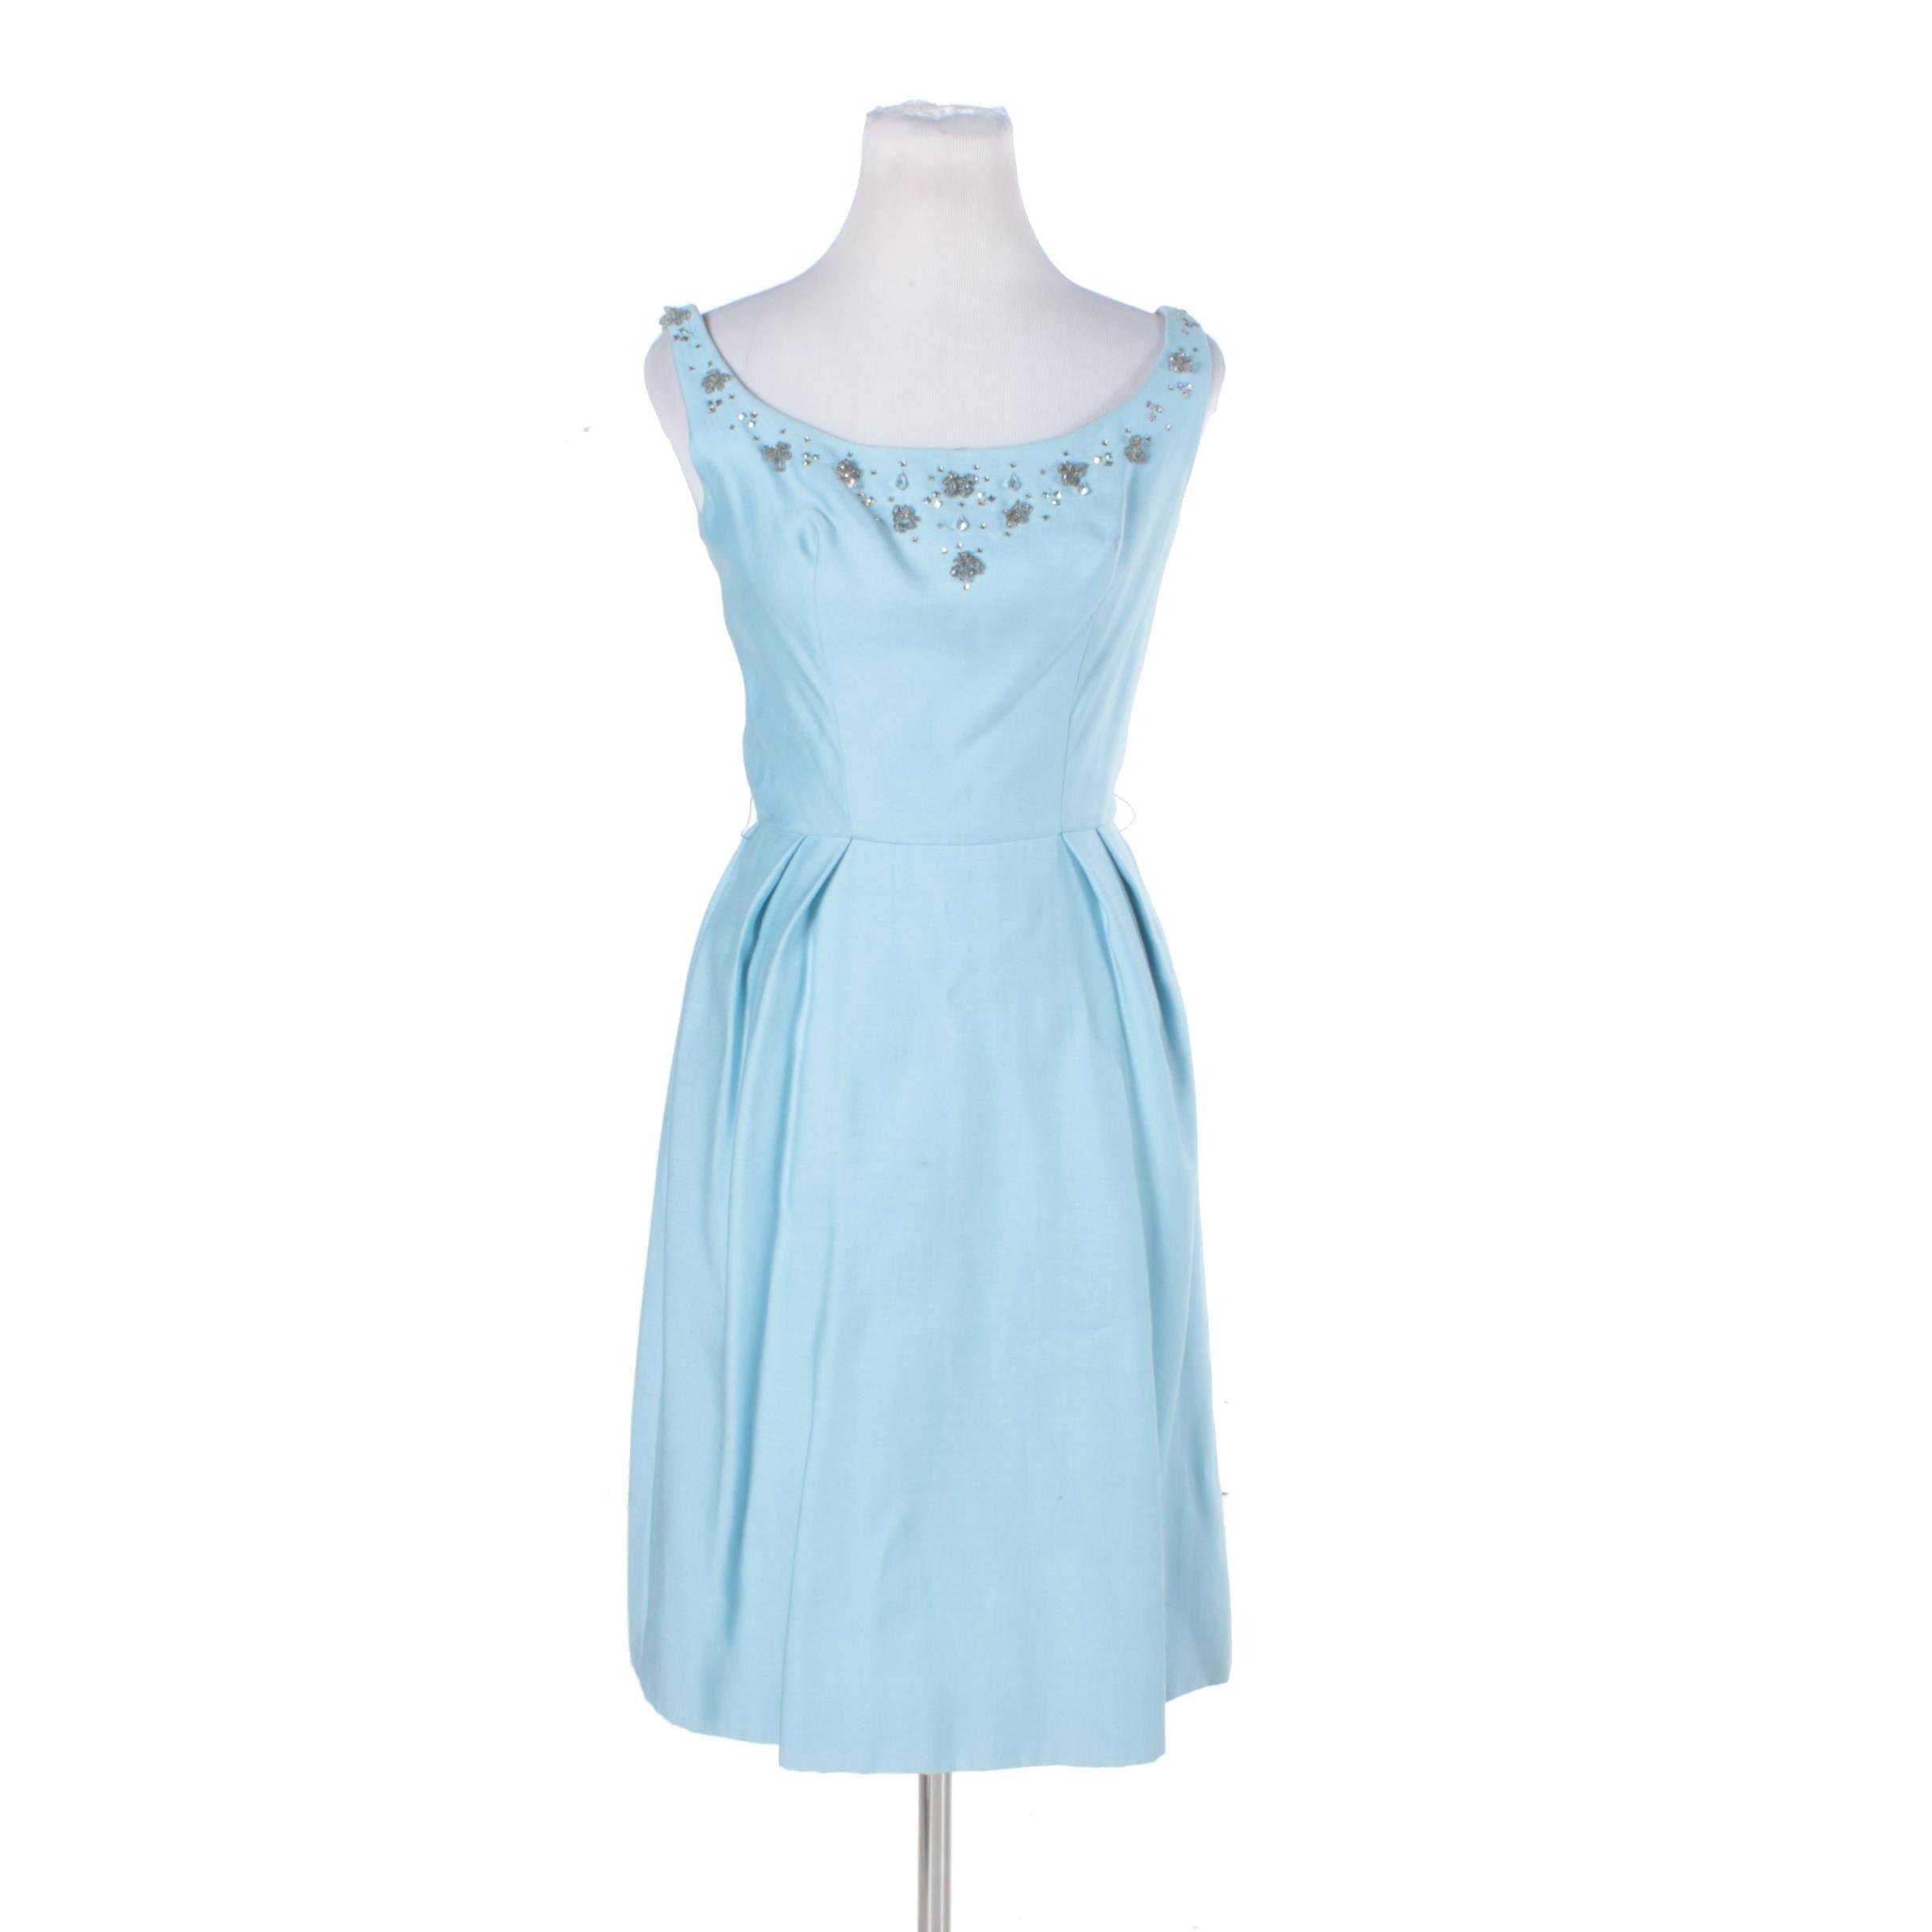 1960s Mardi Gras Sky Blue Beaded Cocktail Dress